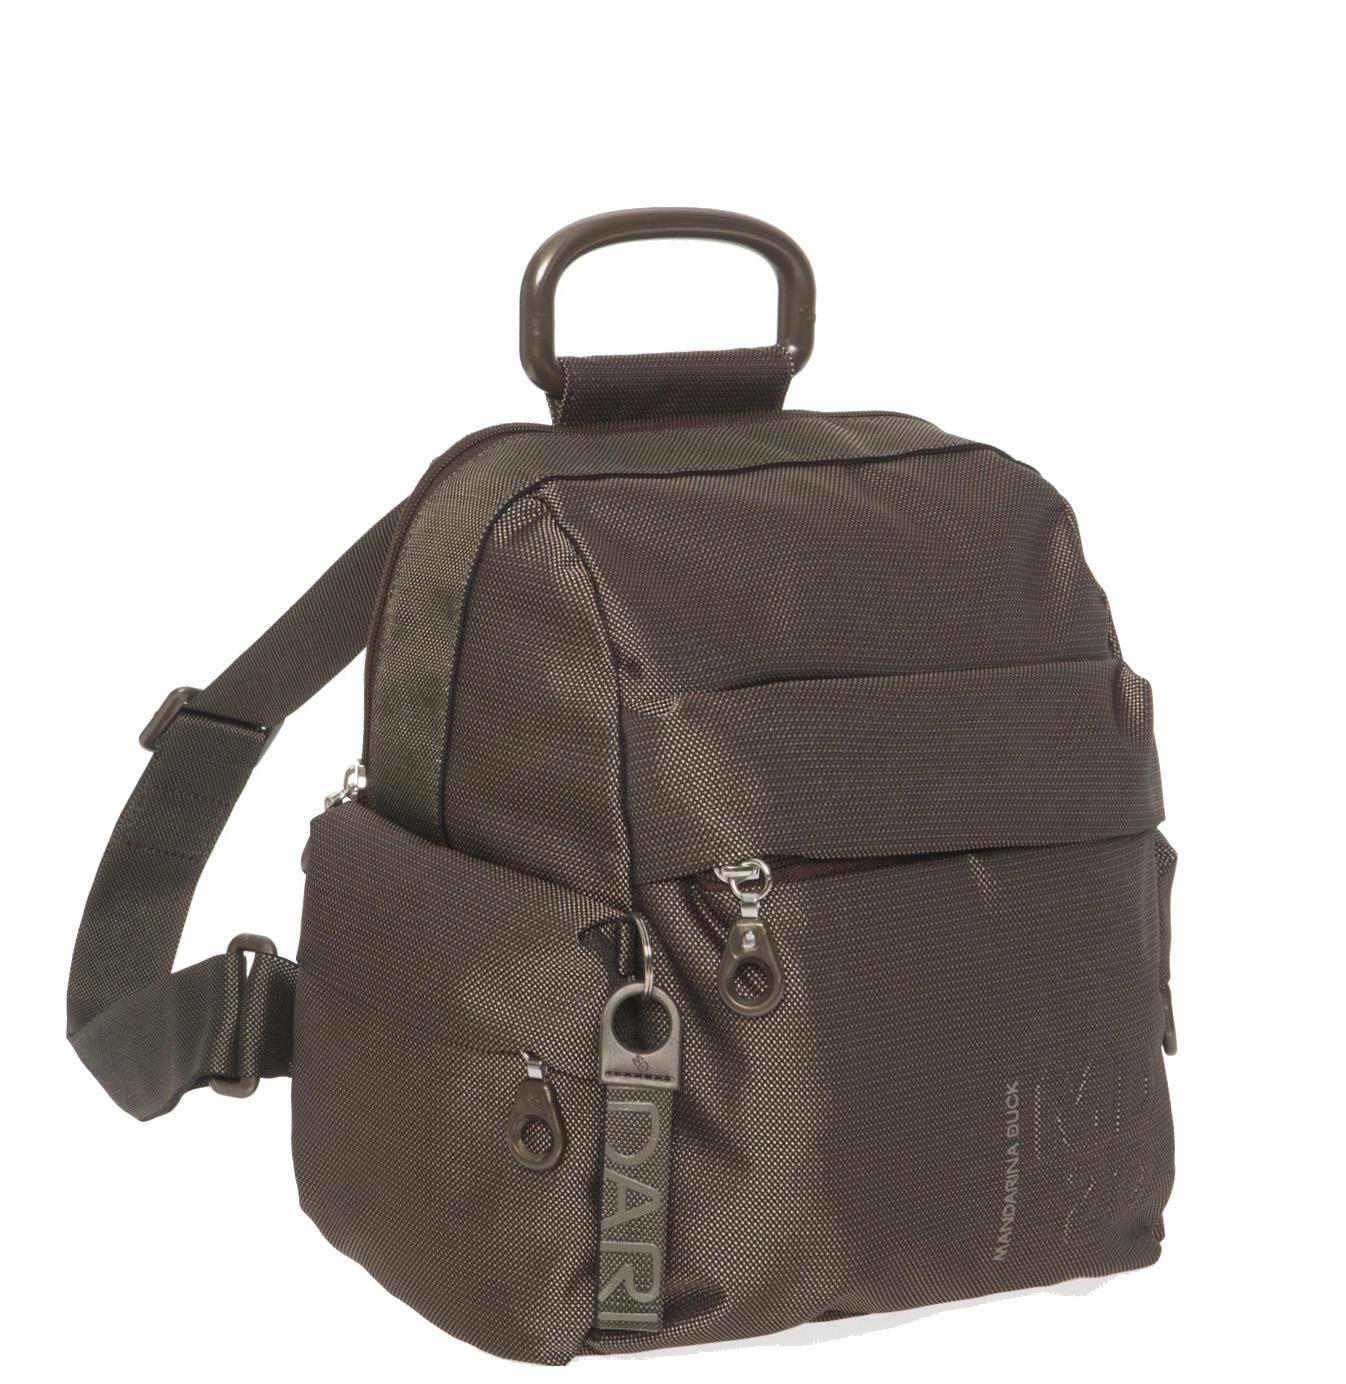 797db524706 Mandarina Duck Md20 Mini Backpack On The Shoulder Pyrite - Shop ...